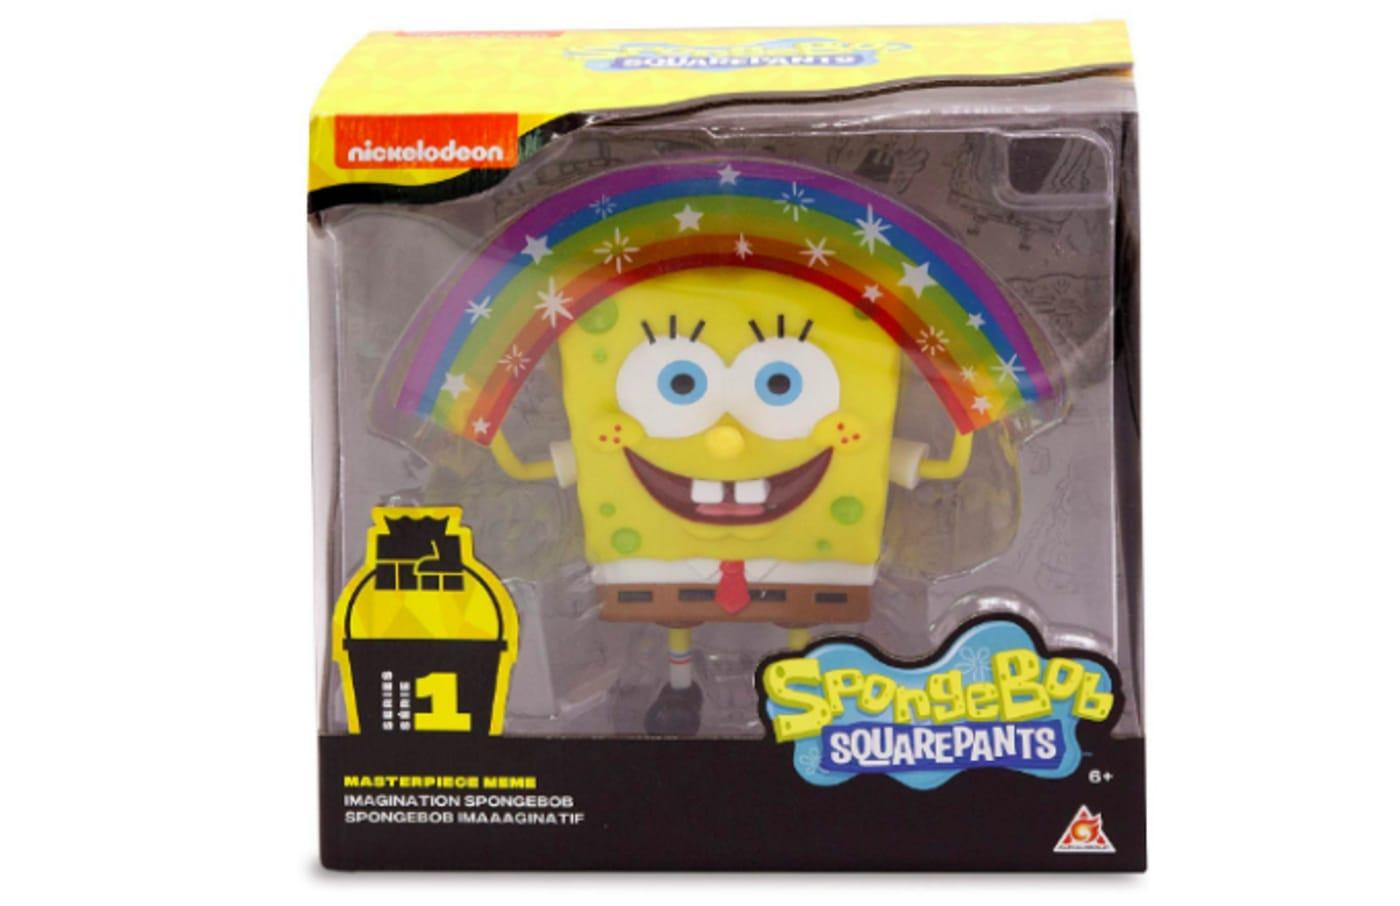 SpongeBob Square Pants Meme Toy